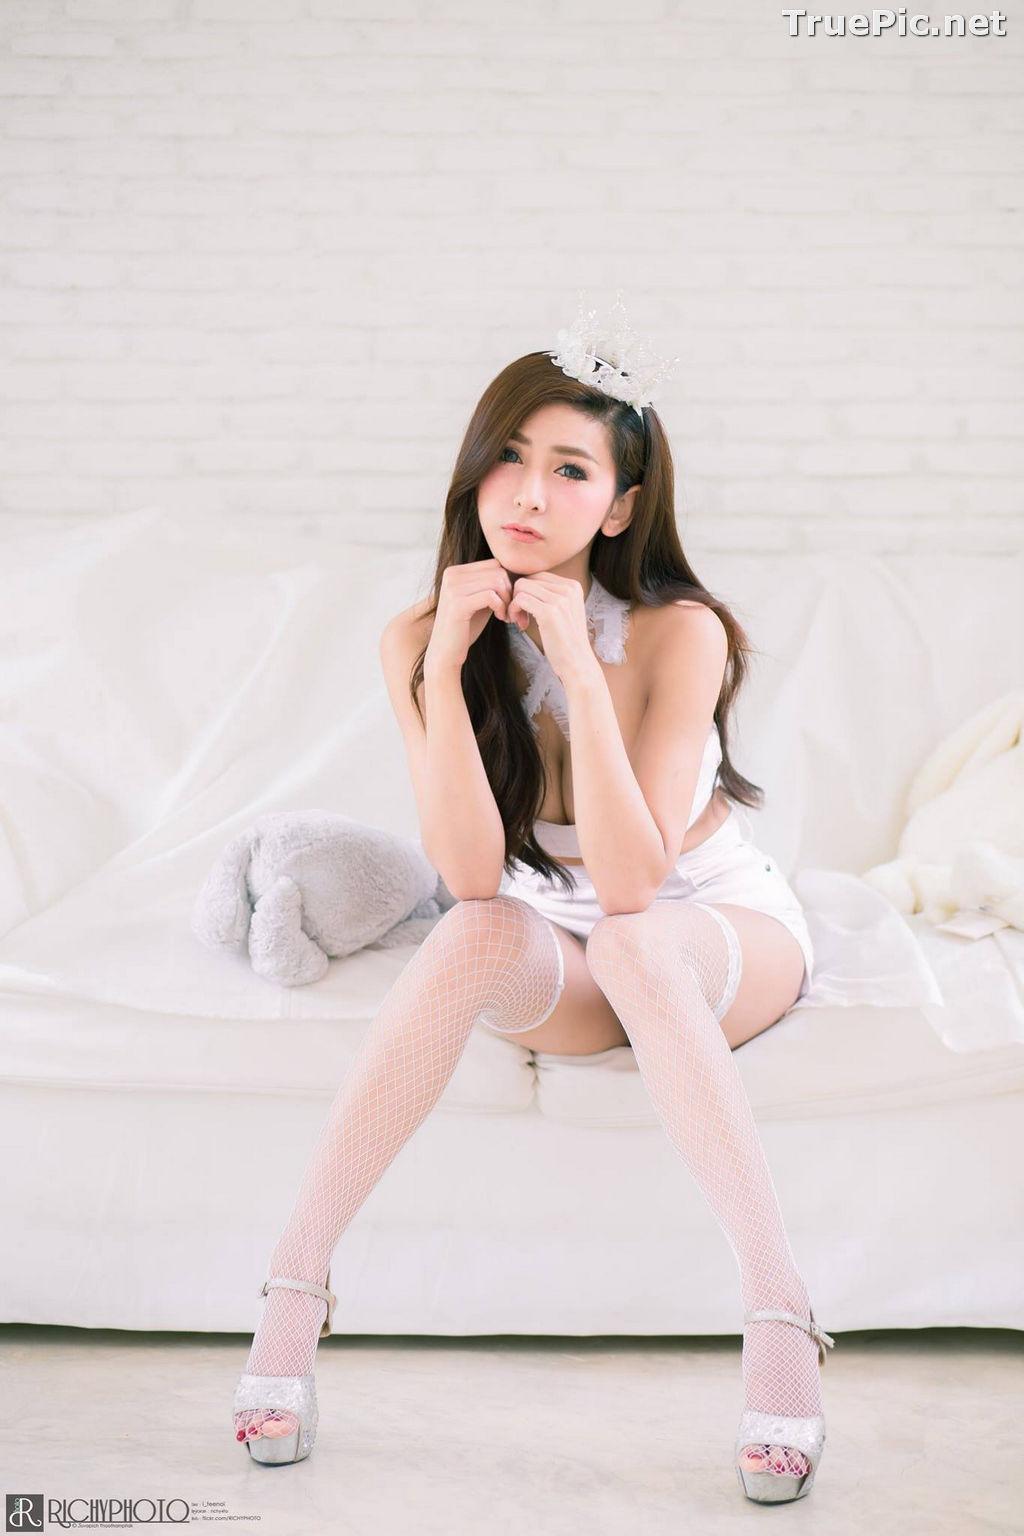 Image Thailand Model - Jurarak Untao - Beautiful in White - TruePic.net - Picture-6